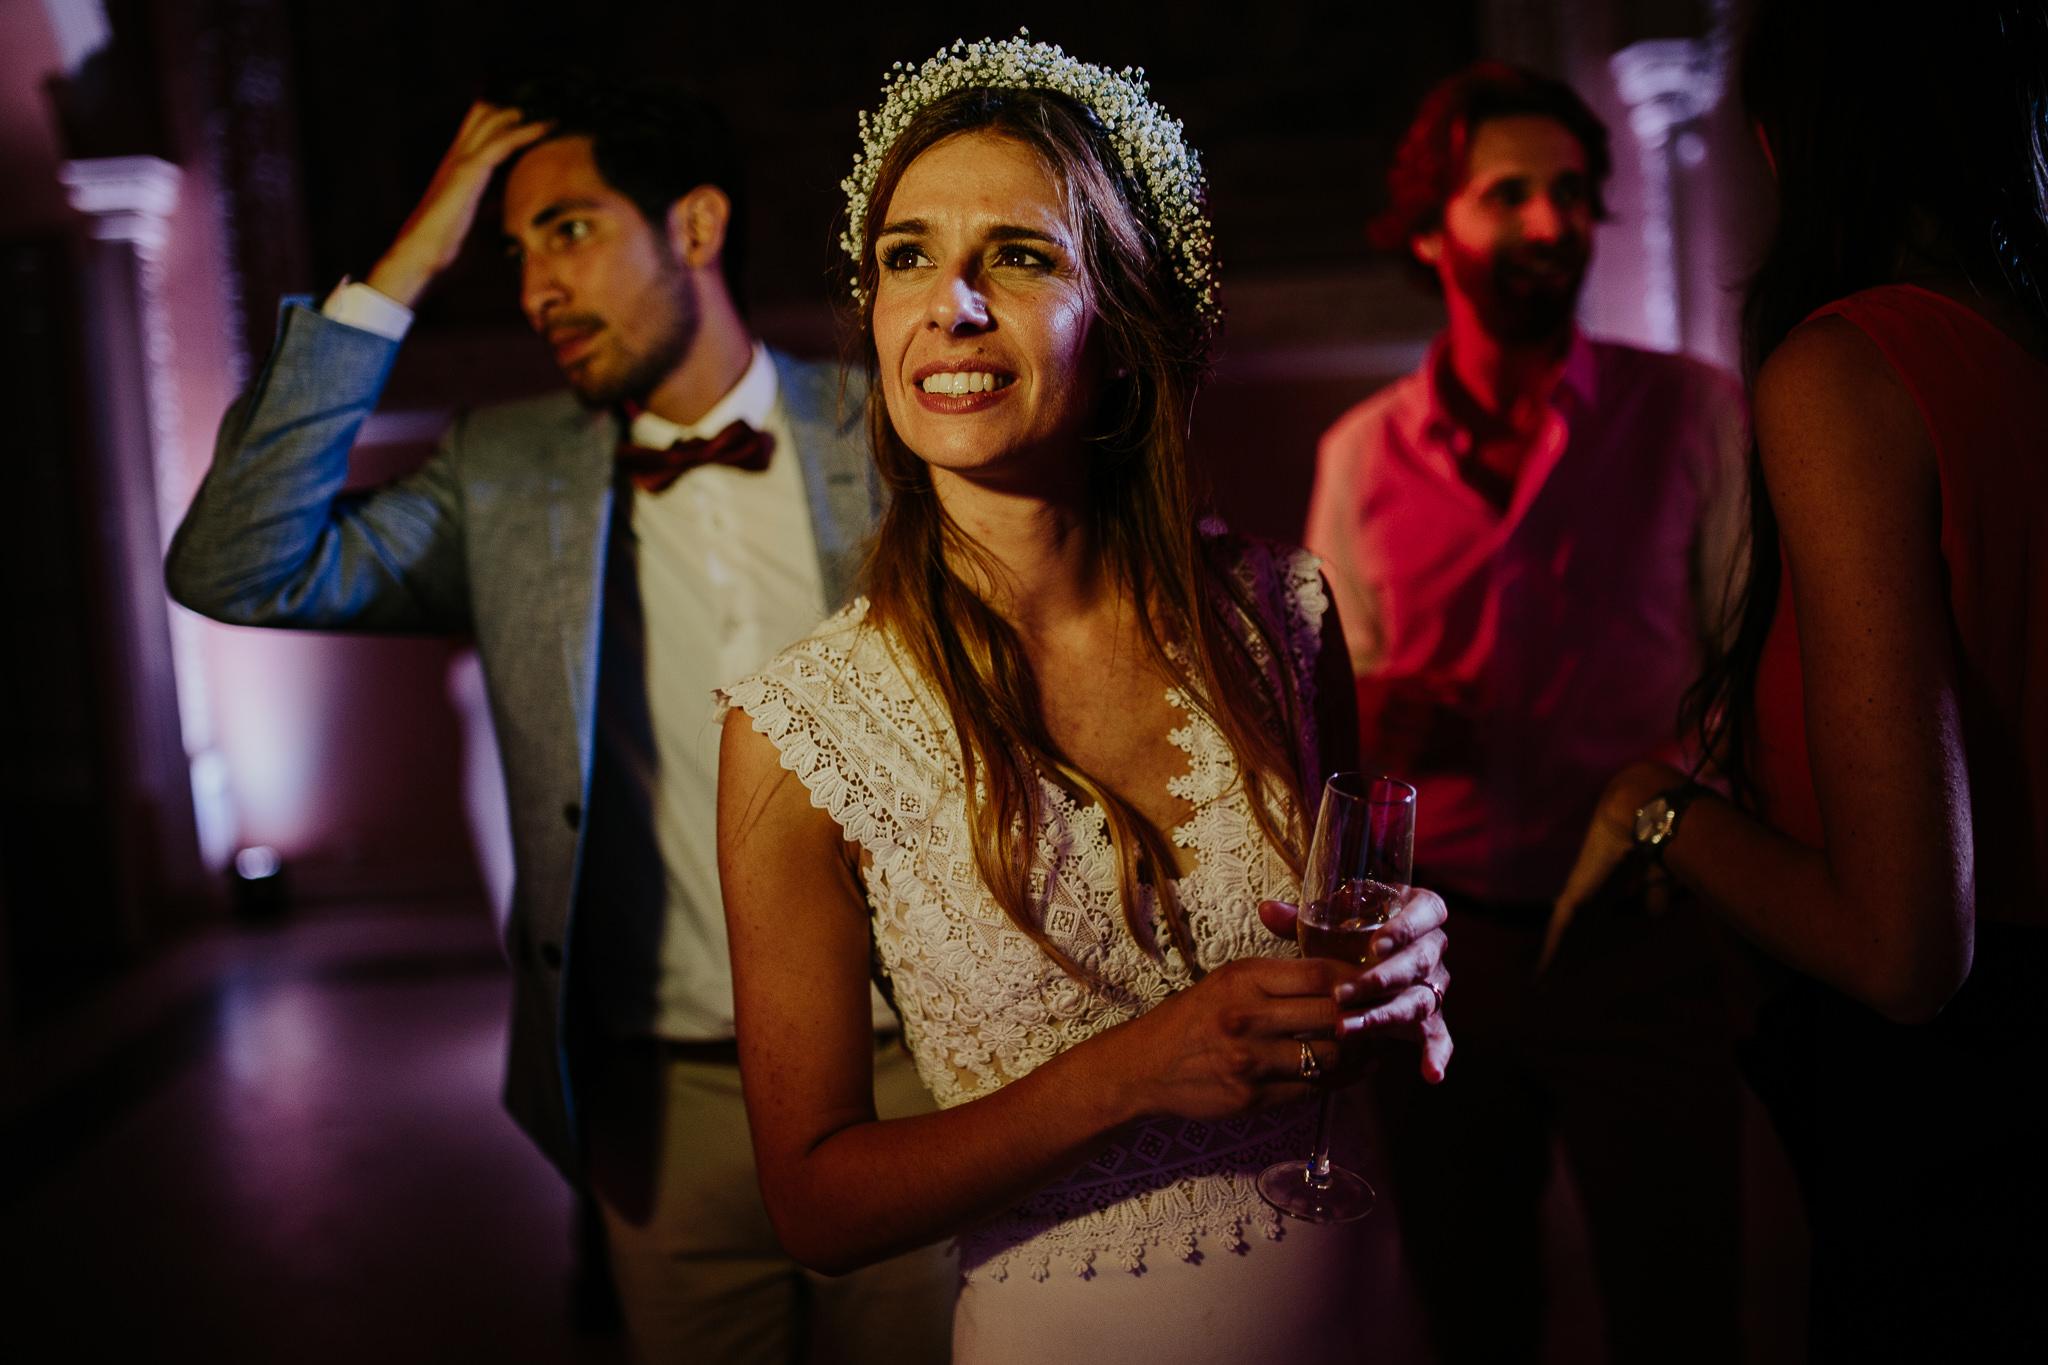 romina_thomas_destination_wedding_photography_fotografia_de_casamento_lisbon_sintra_penha_longa_resort-64